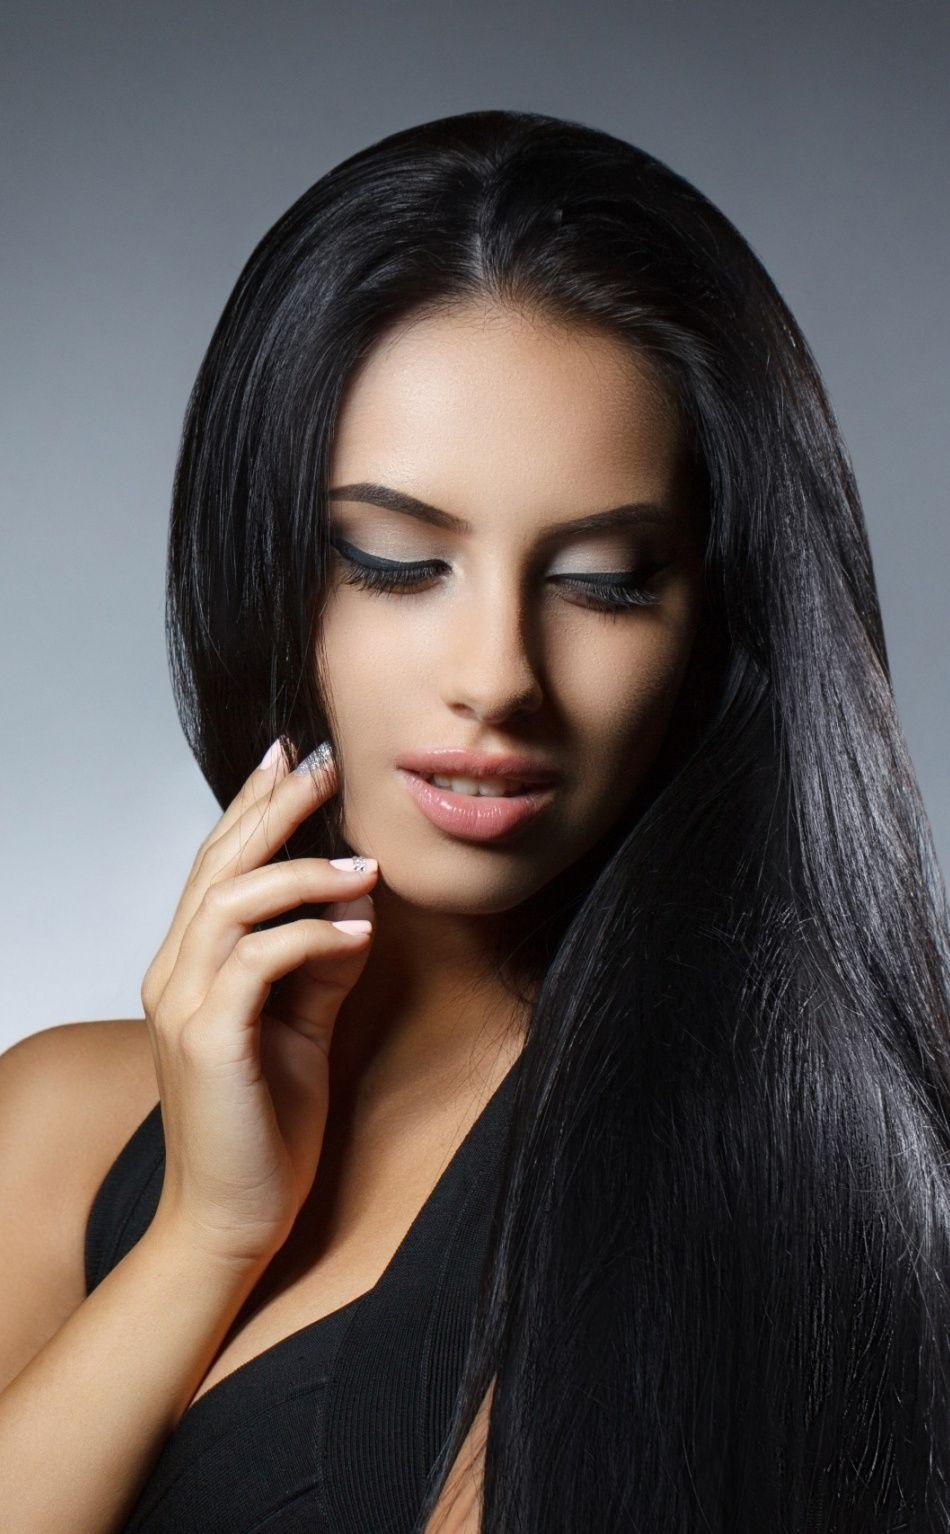 Close Eyes Woman Model Black Hair 950x1534 Wallpaper Black Hair Beautiful Women Faces Female Models